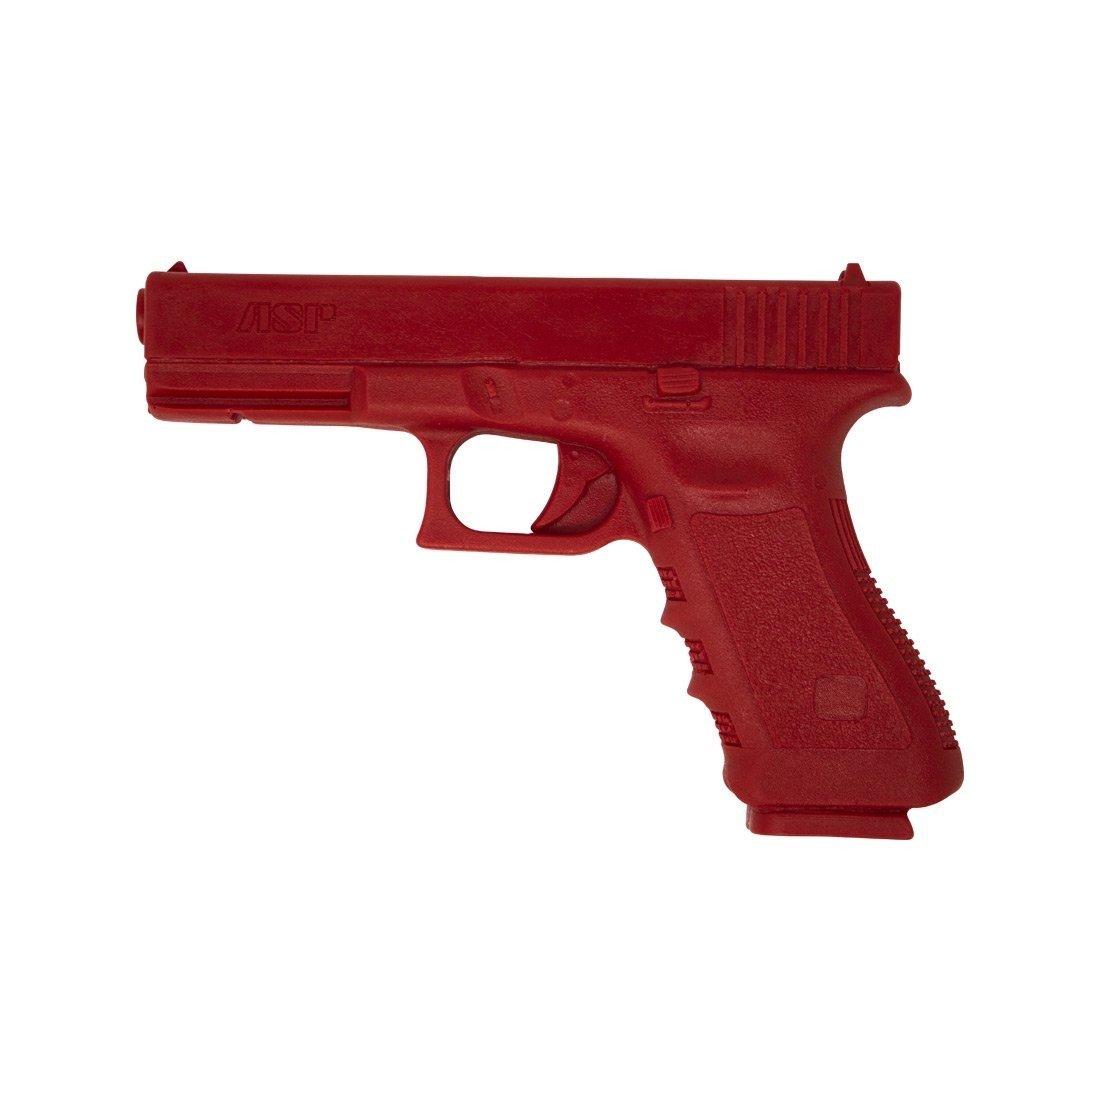 PISTOLA RED GUN GLOCK 17